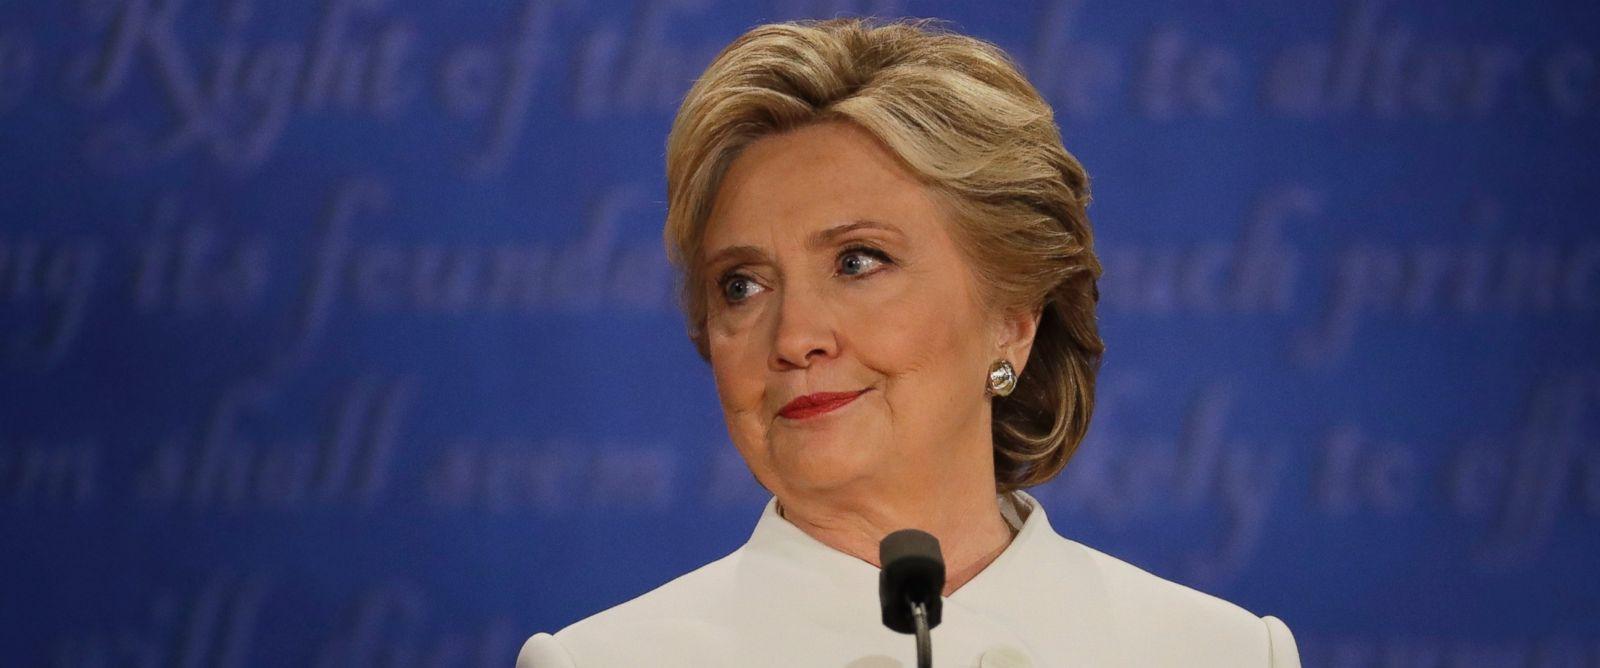 #ElectionNight: MSNBC'S Rachel Maddow Has The Sads [VIDEO}